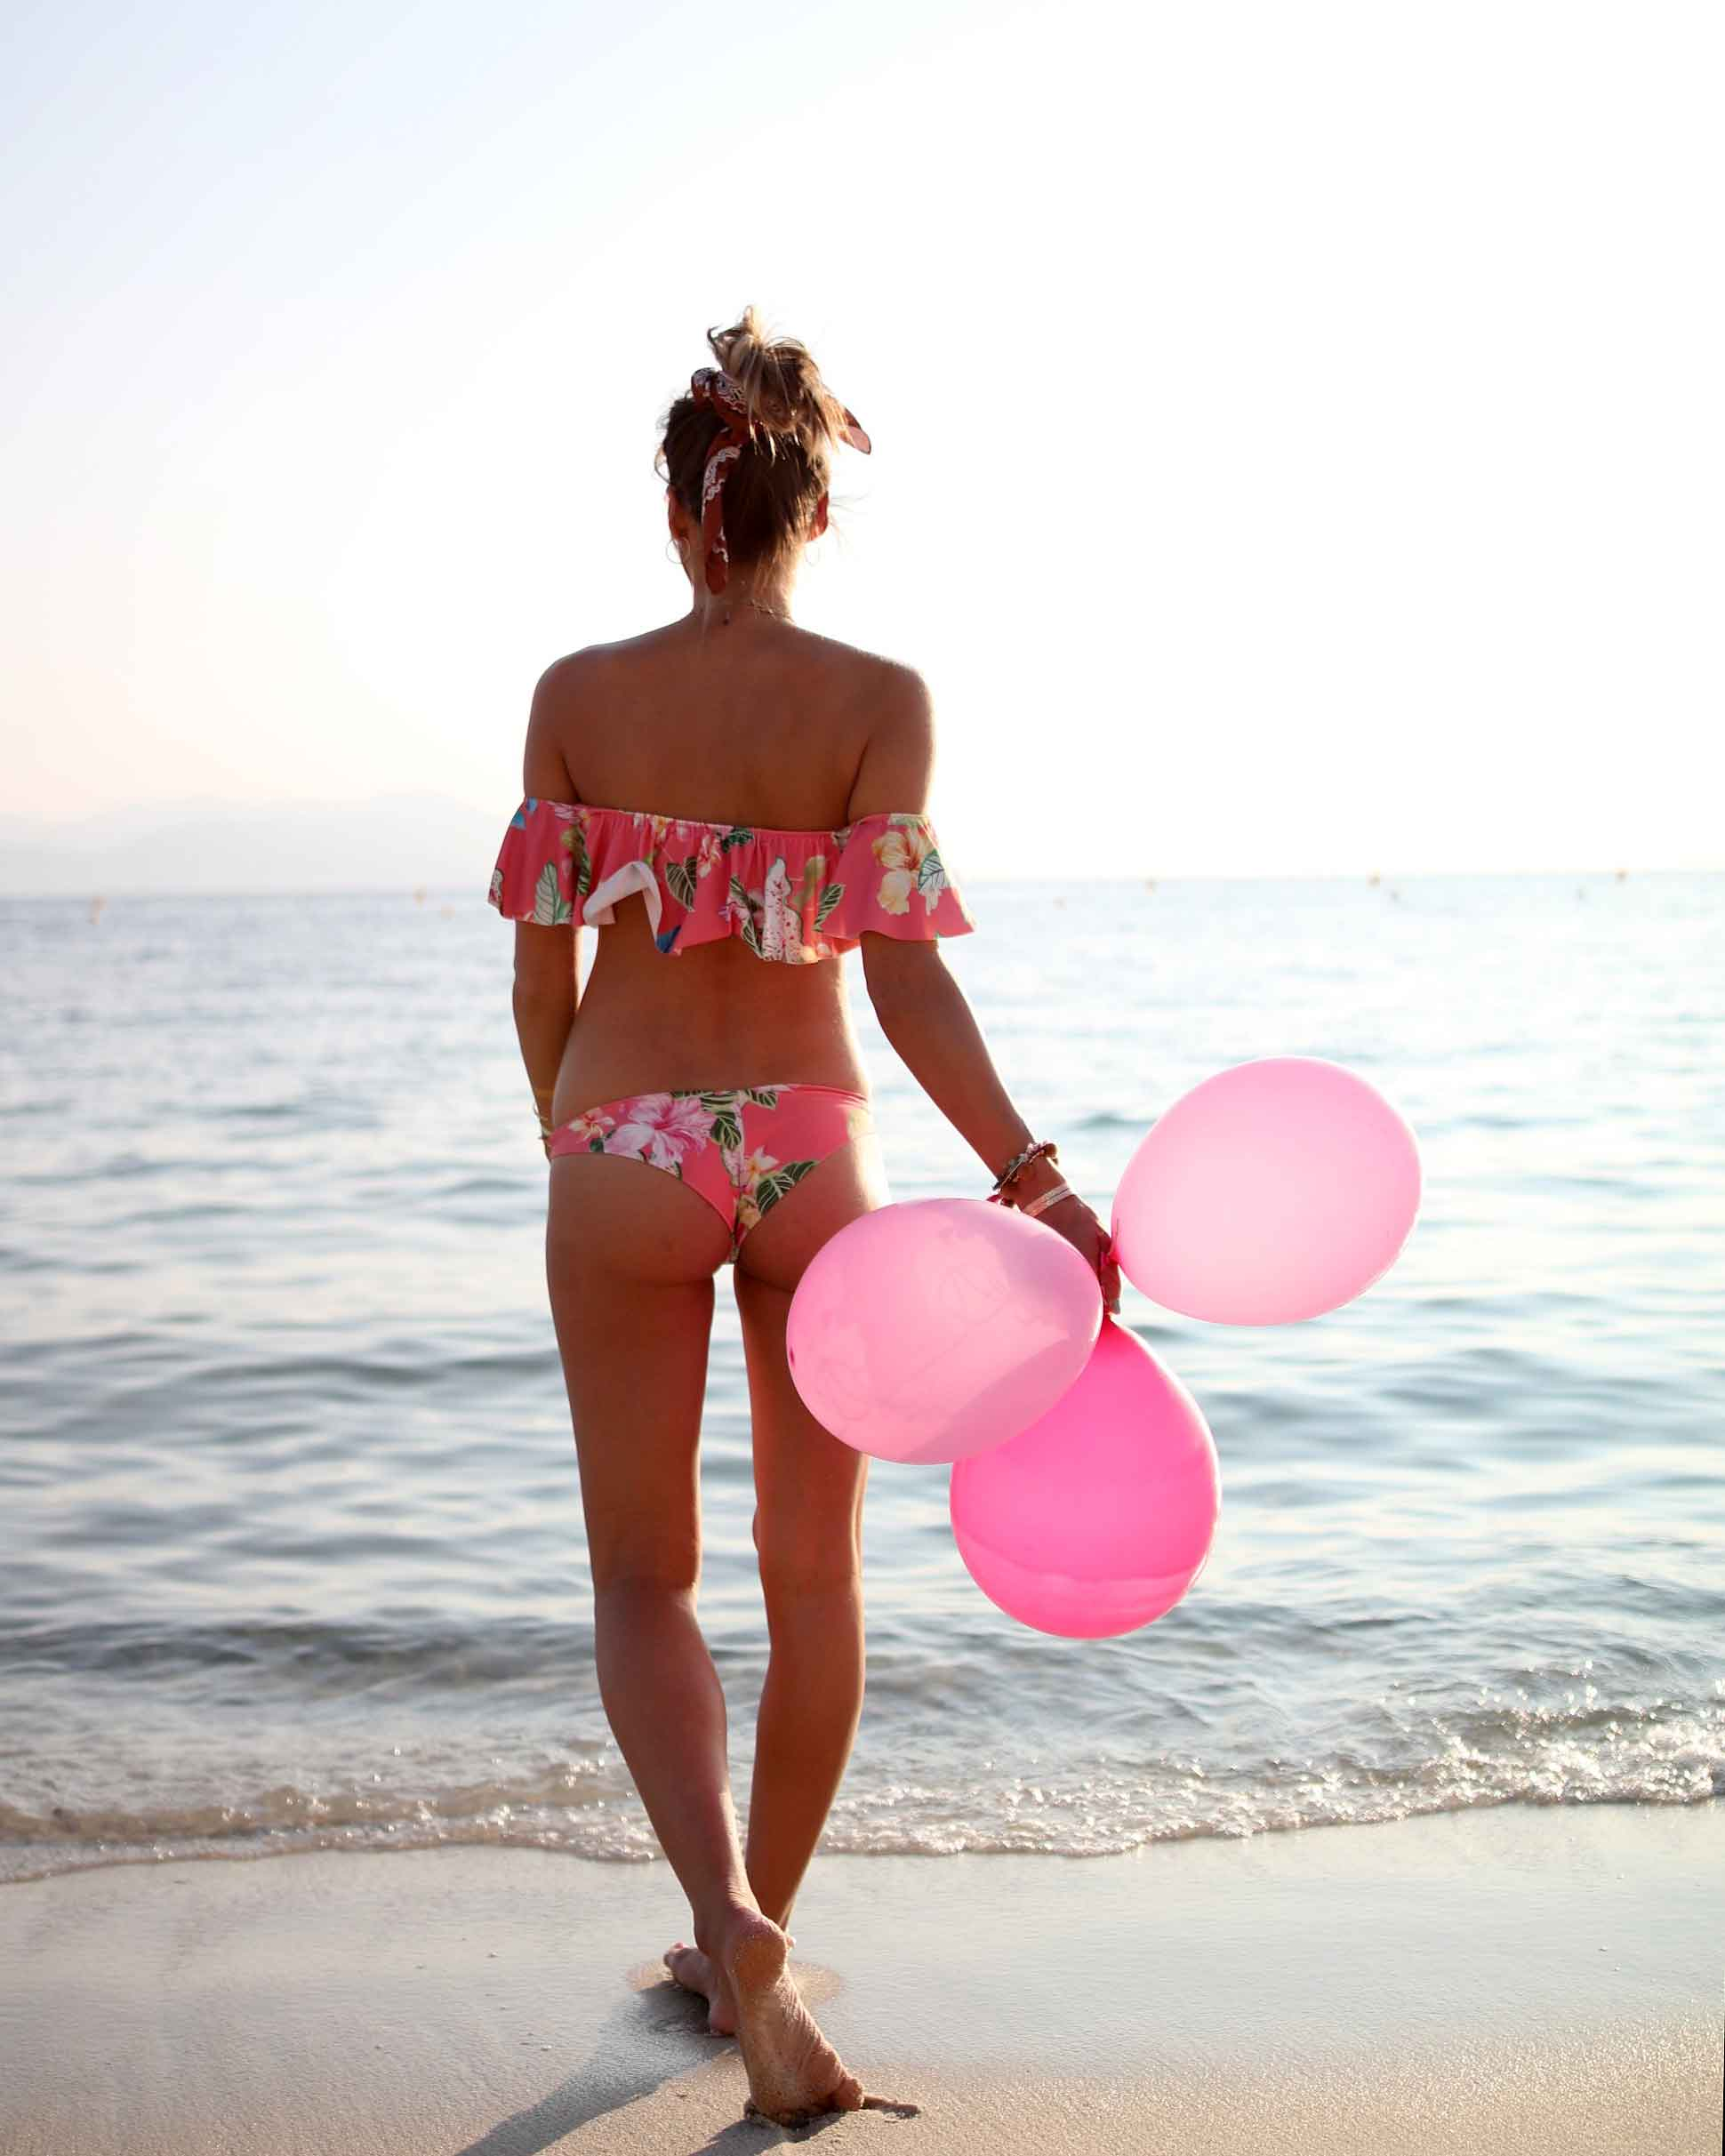 birthday girls, ruffle bikinis, mon petit bikini, bikini, pink baloons, beach life, bikini body